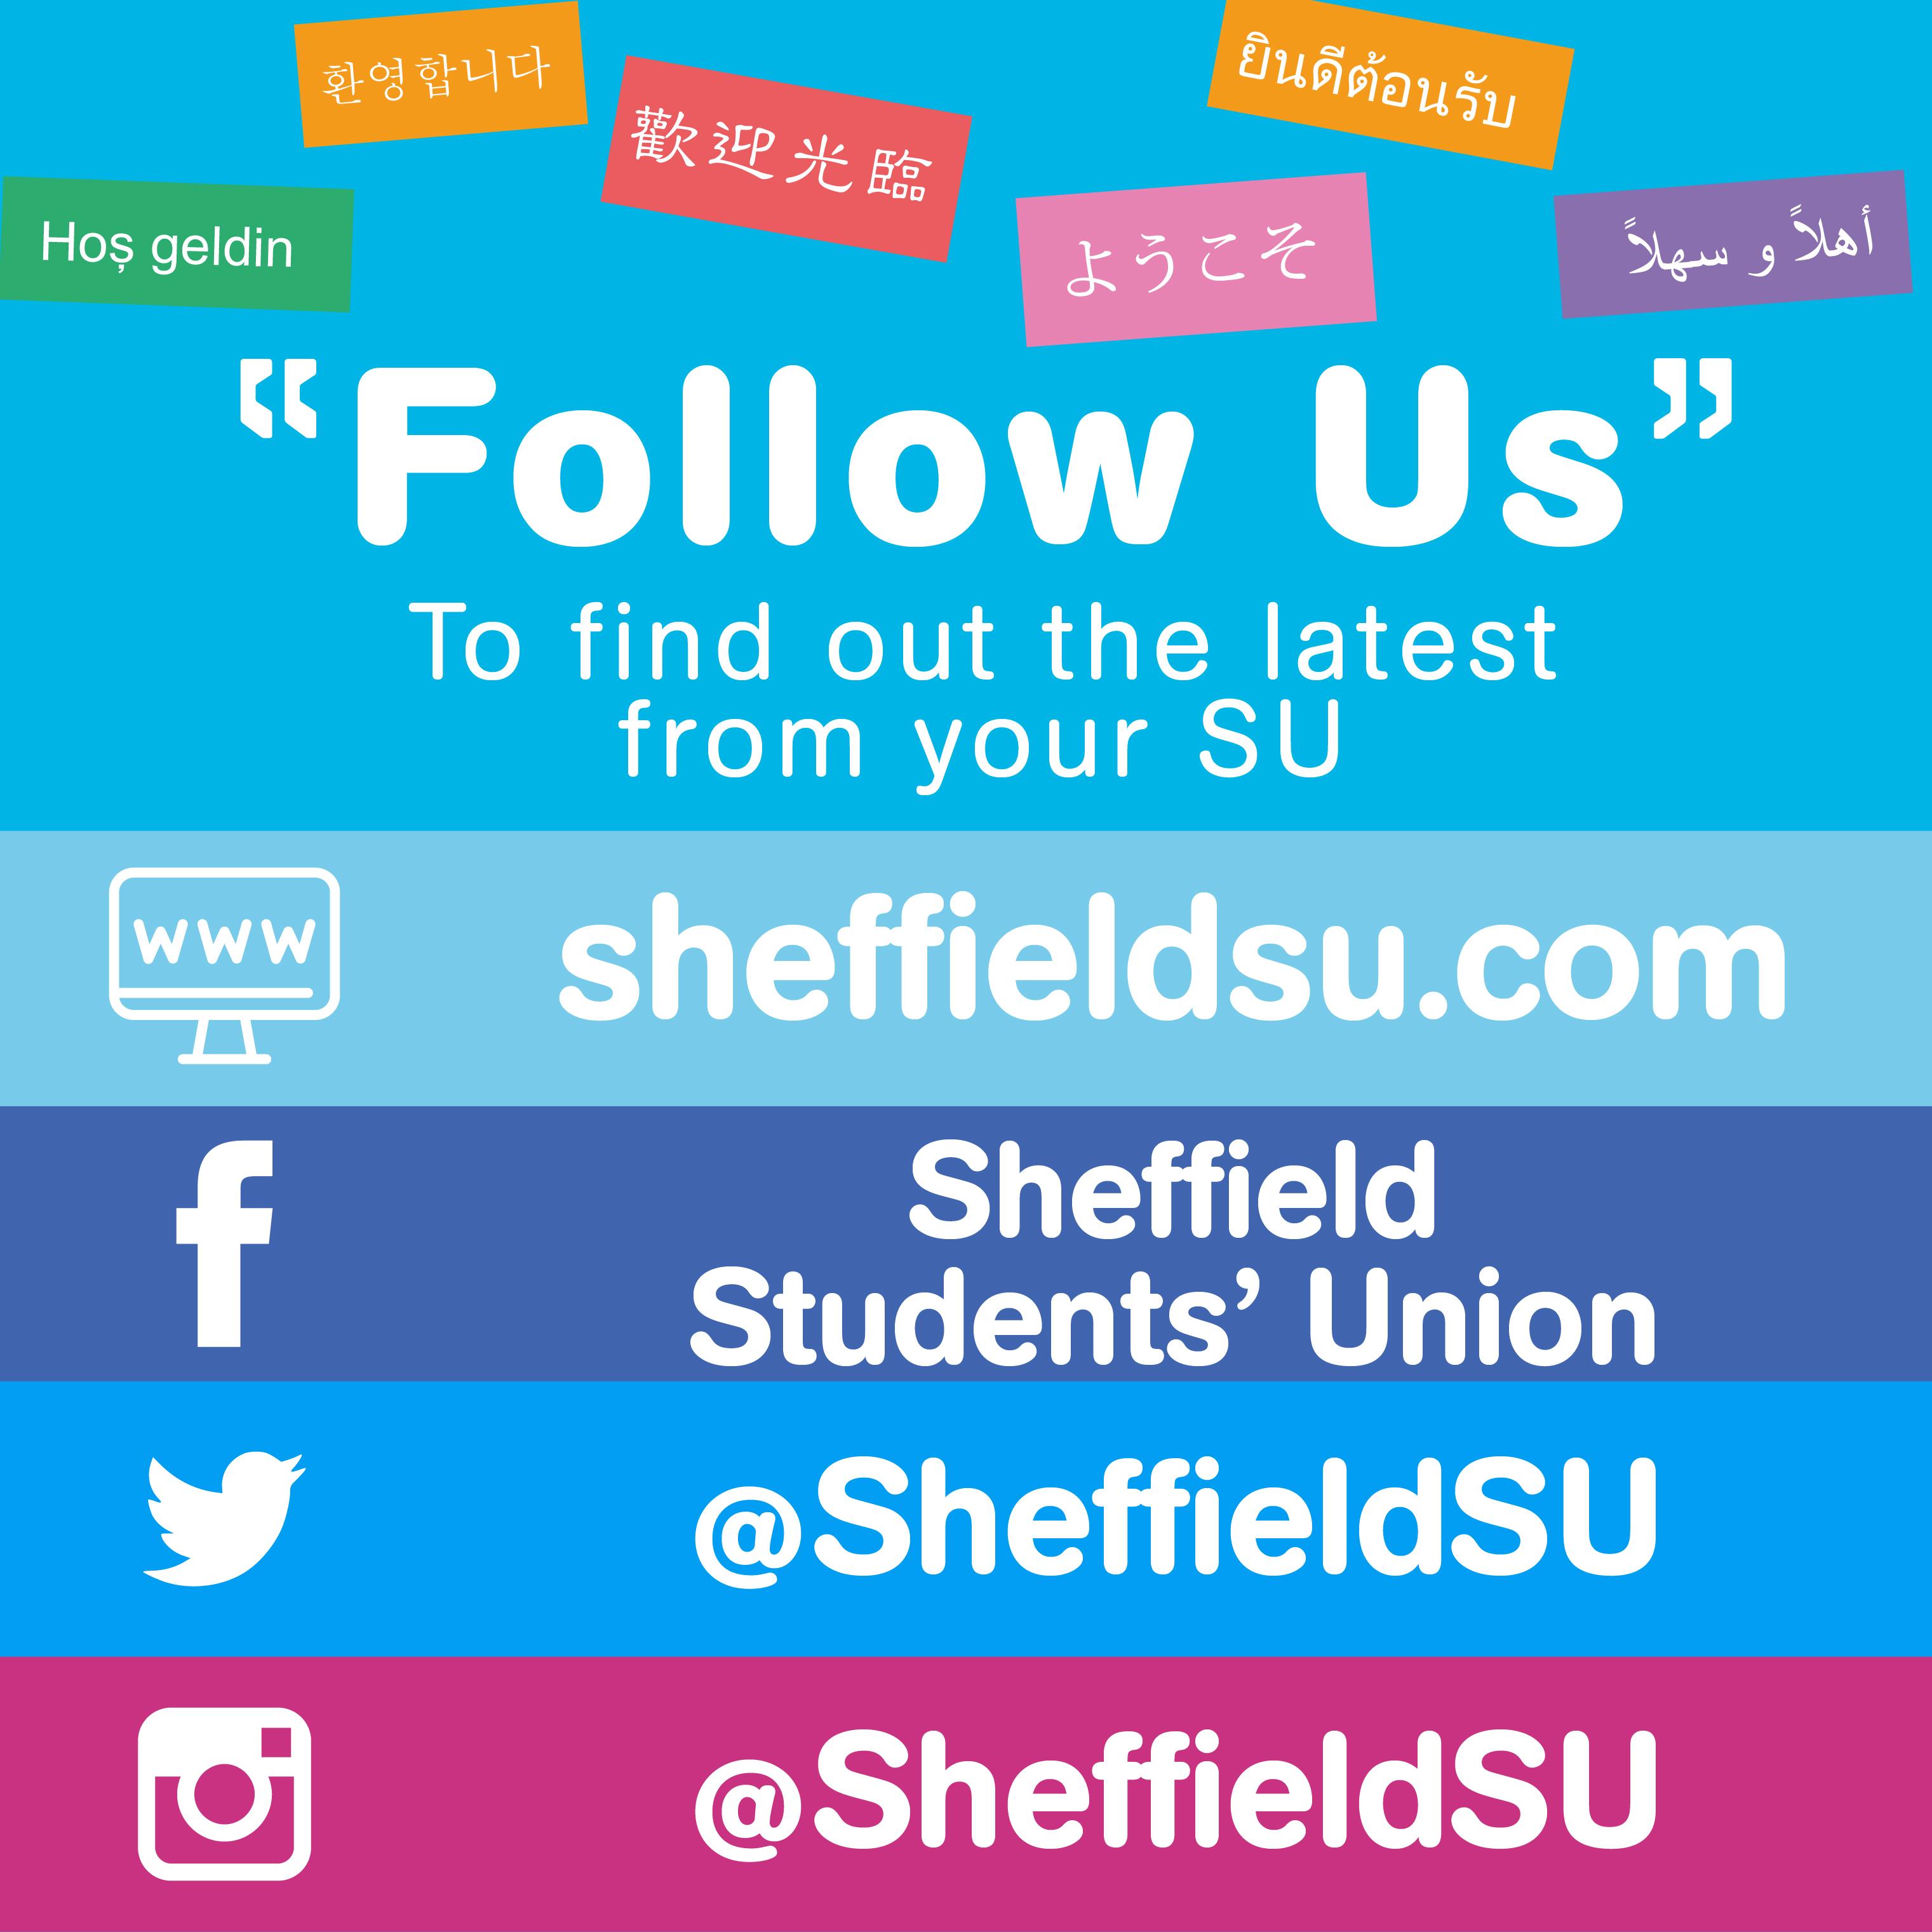 Sheffield Students' Union